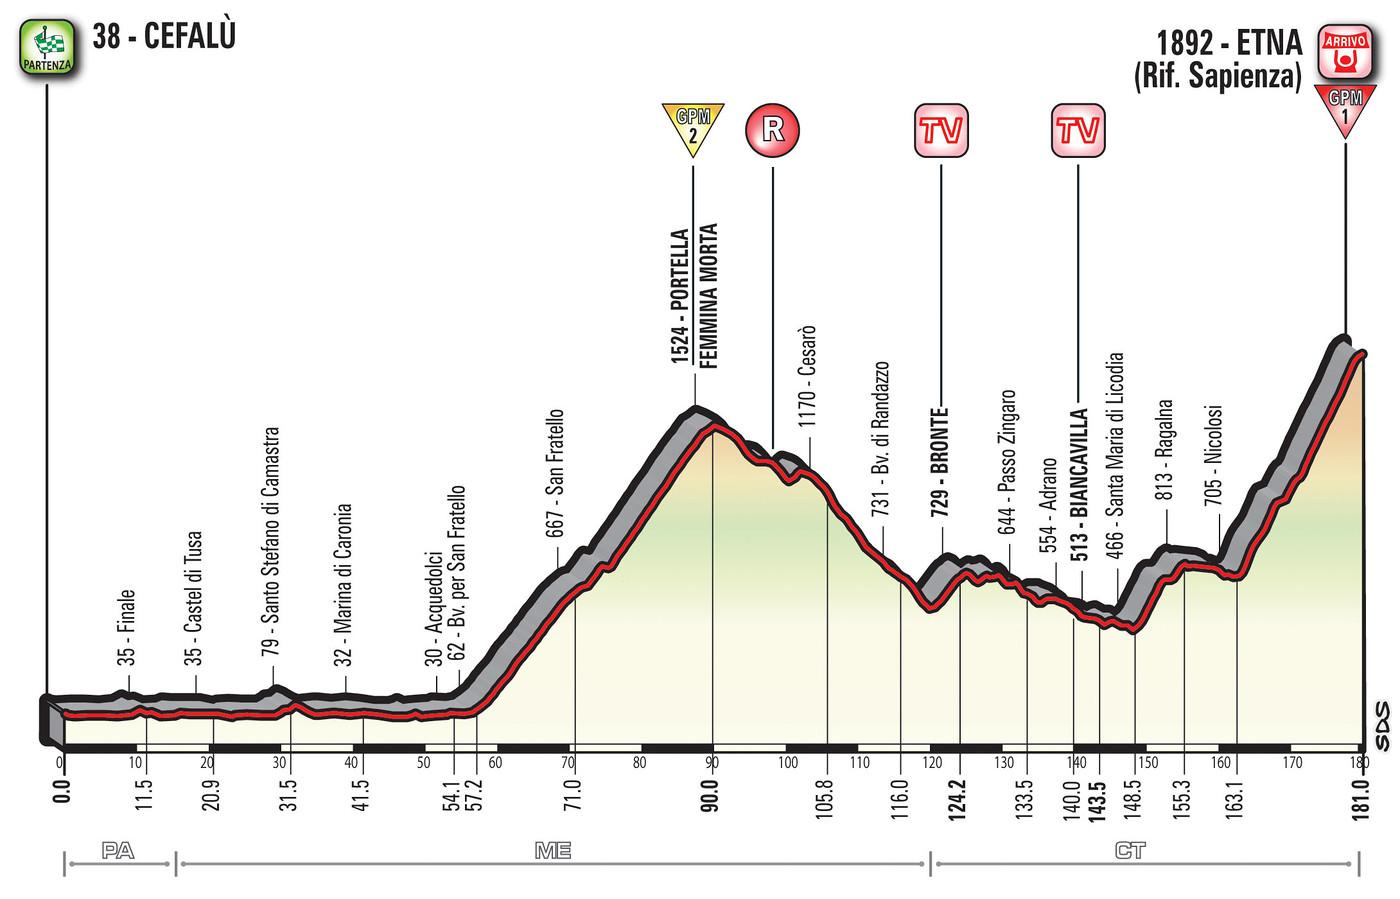 Giro 2017 Stage 4 profile